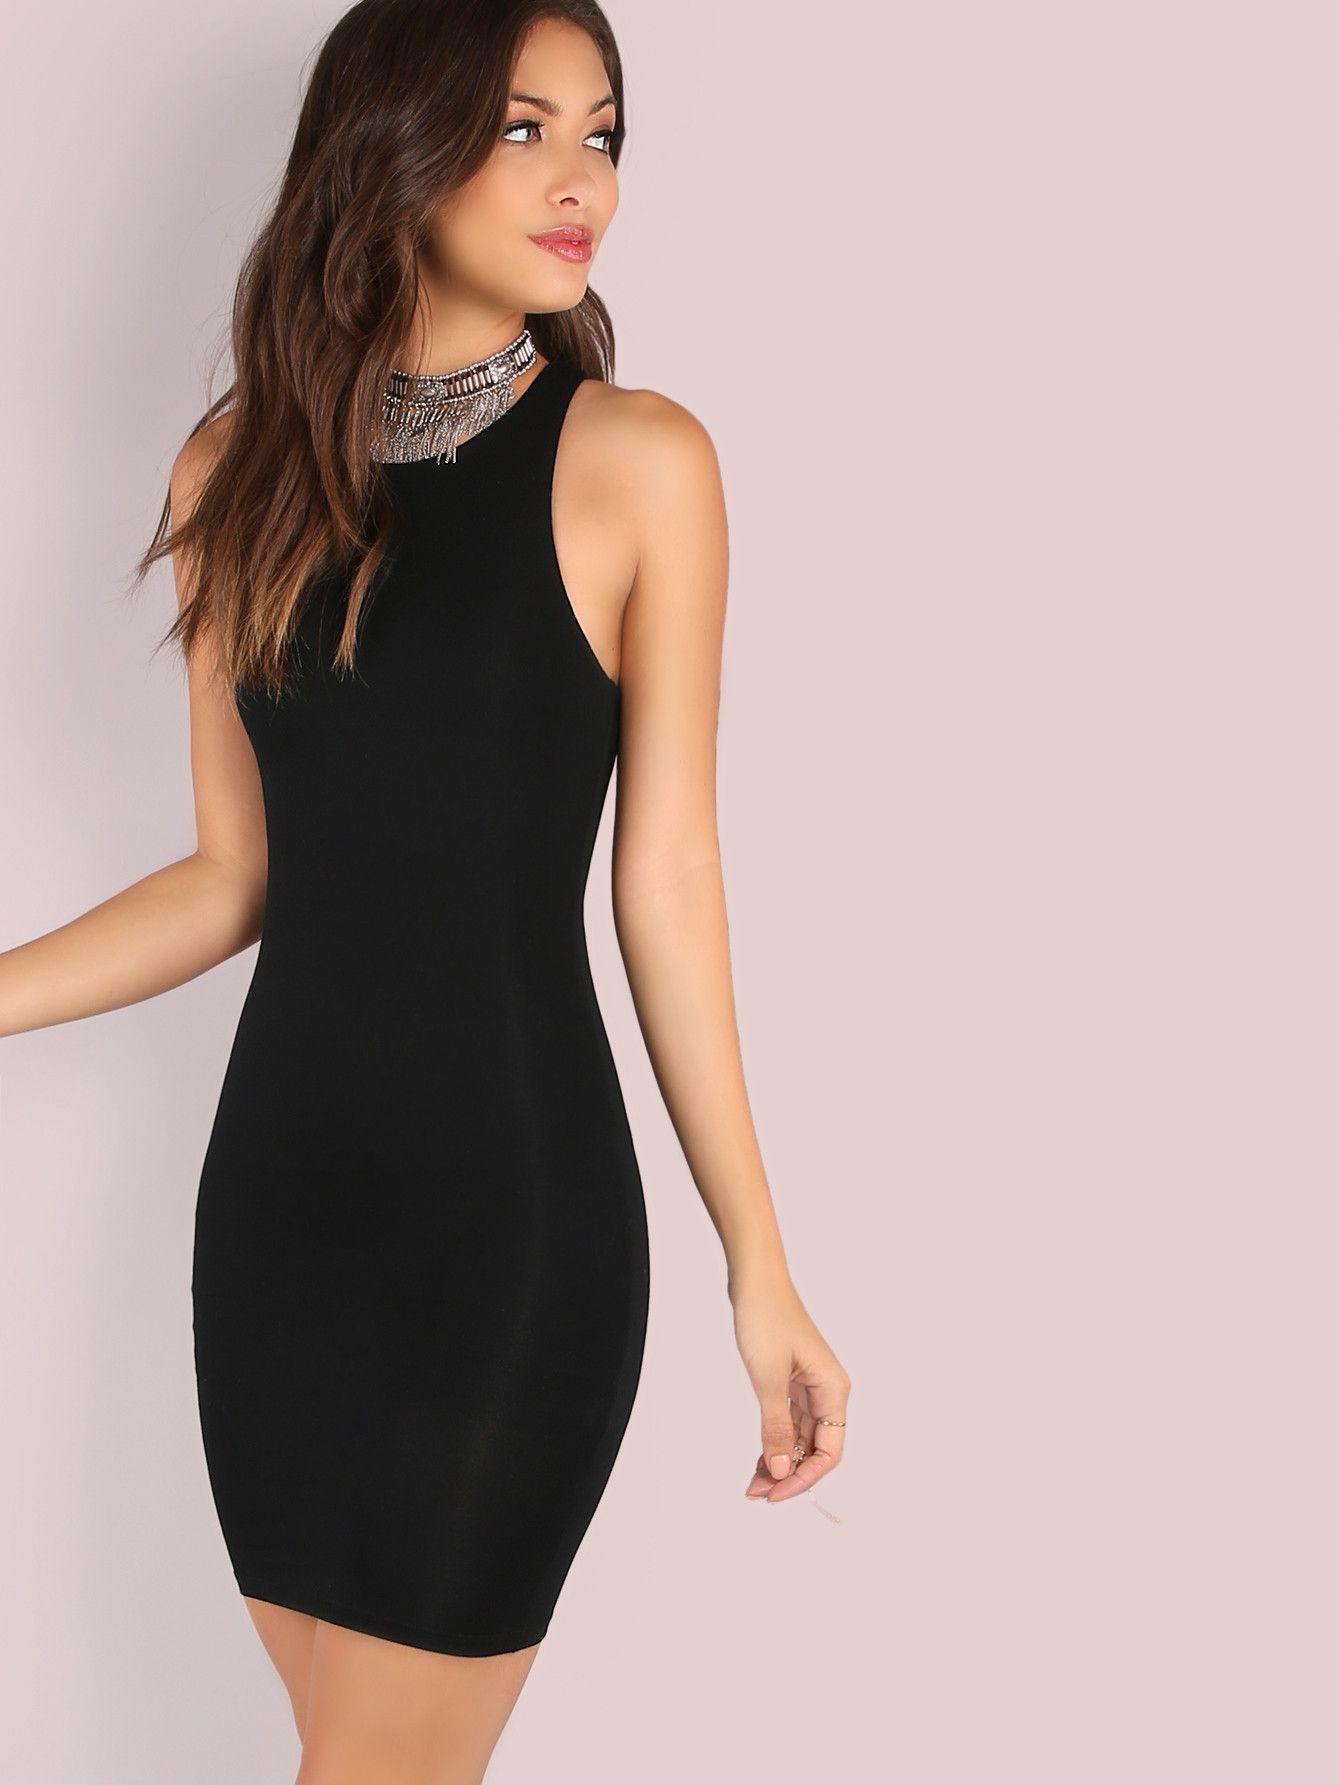 fdce616f08 Black Racer Bodycon Dress